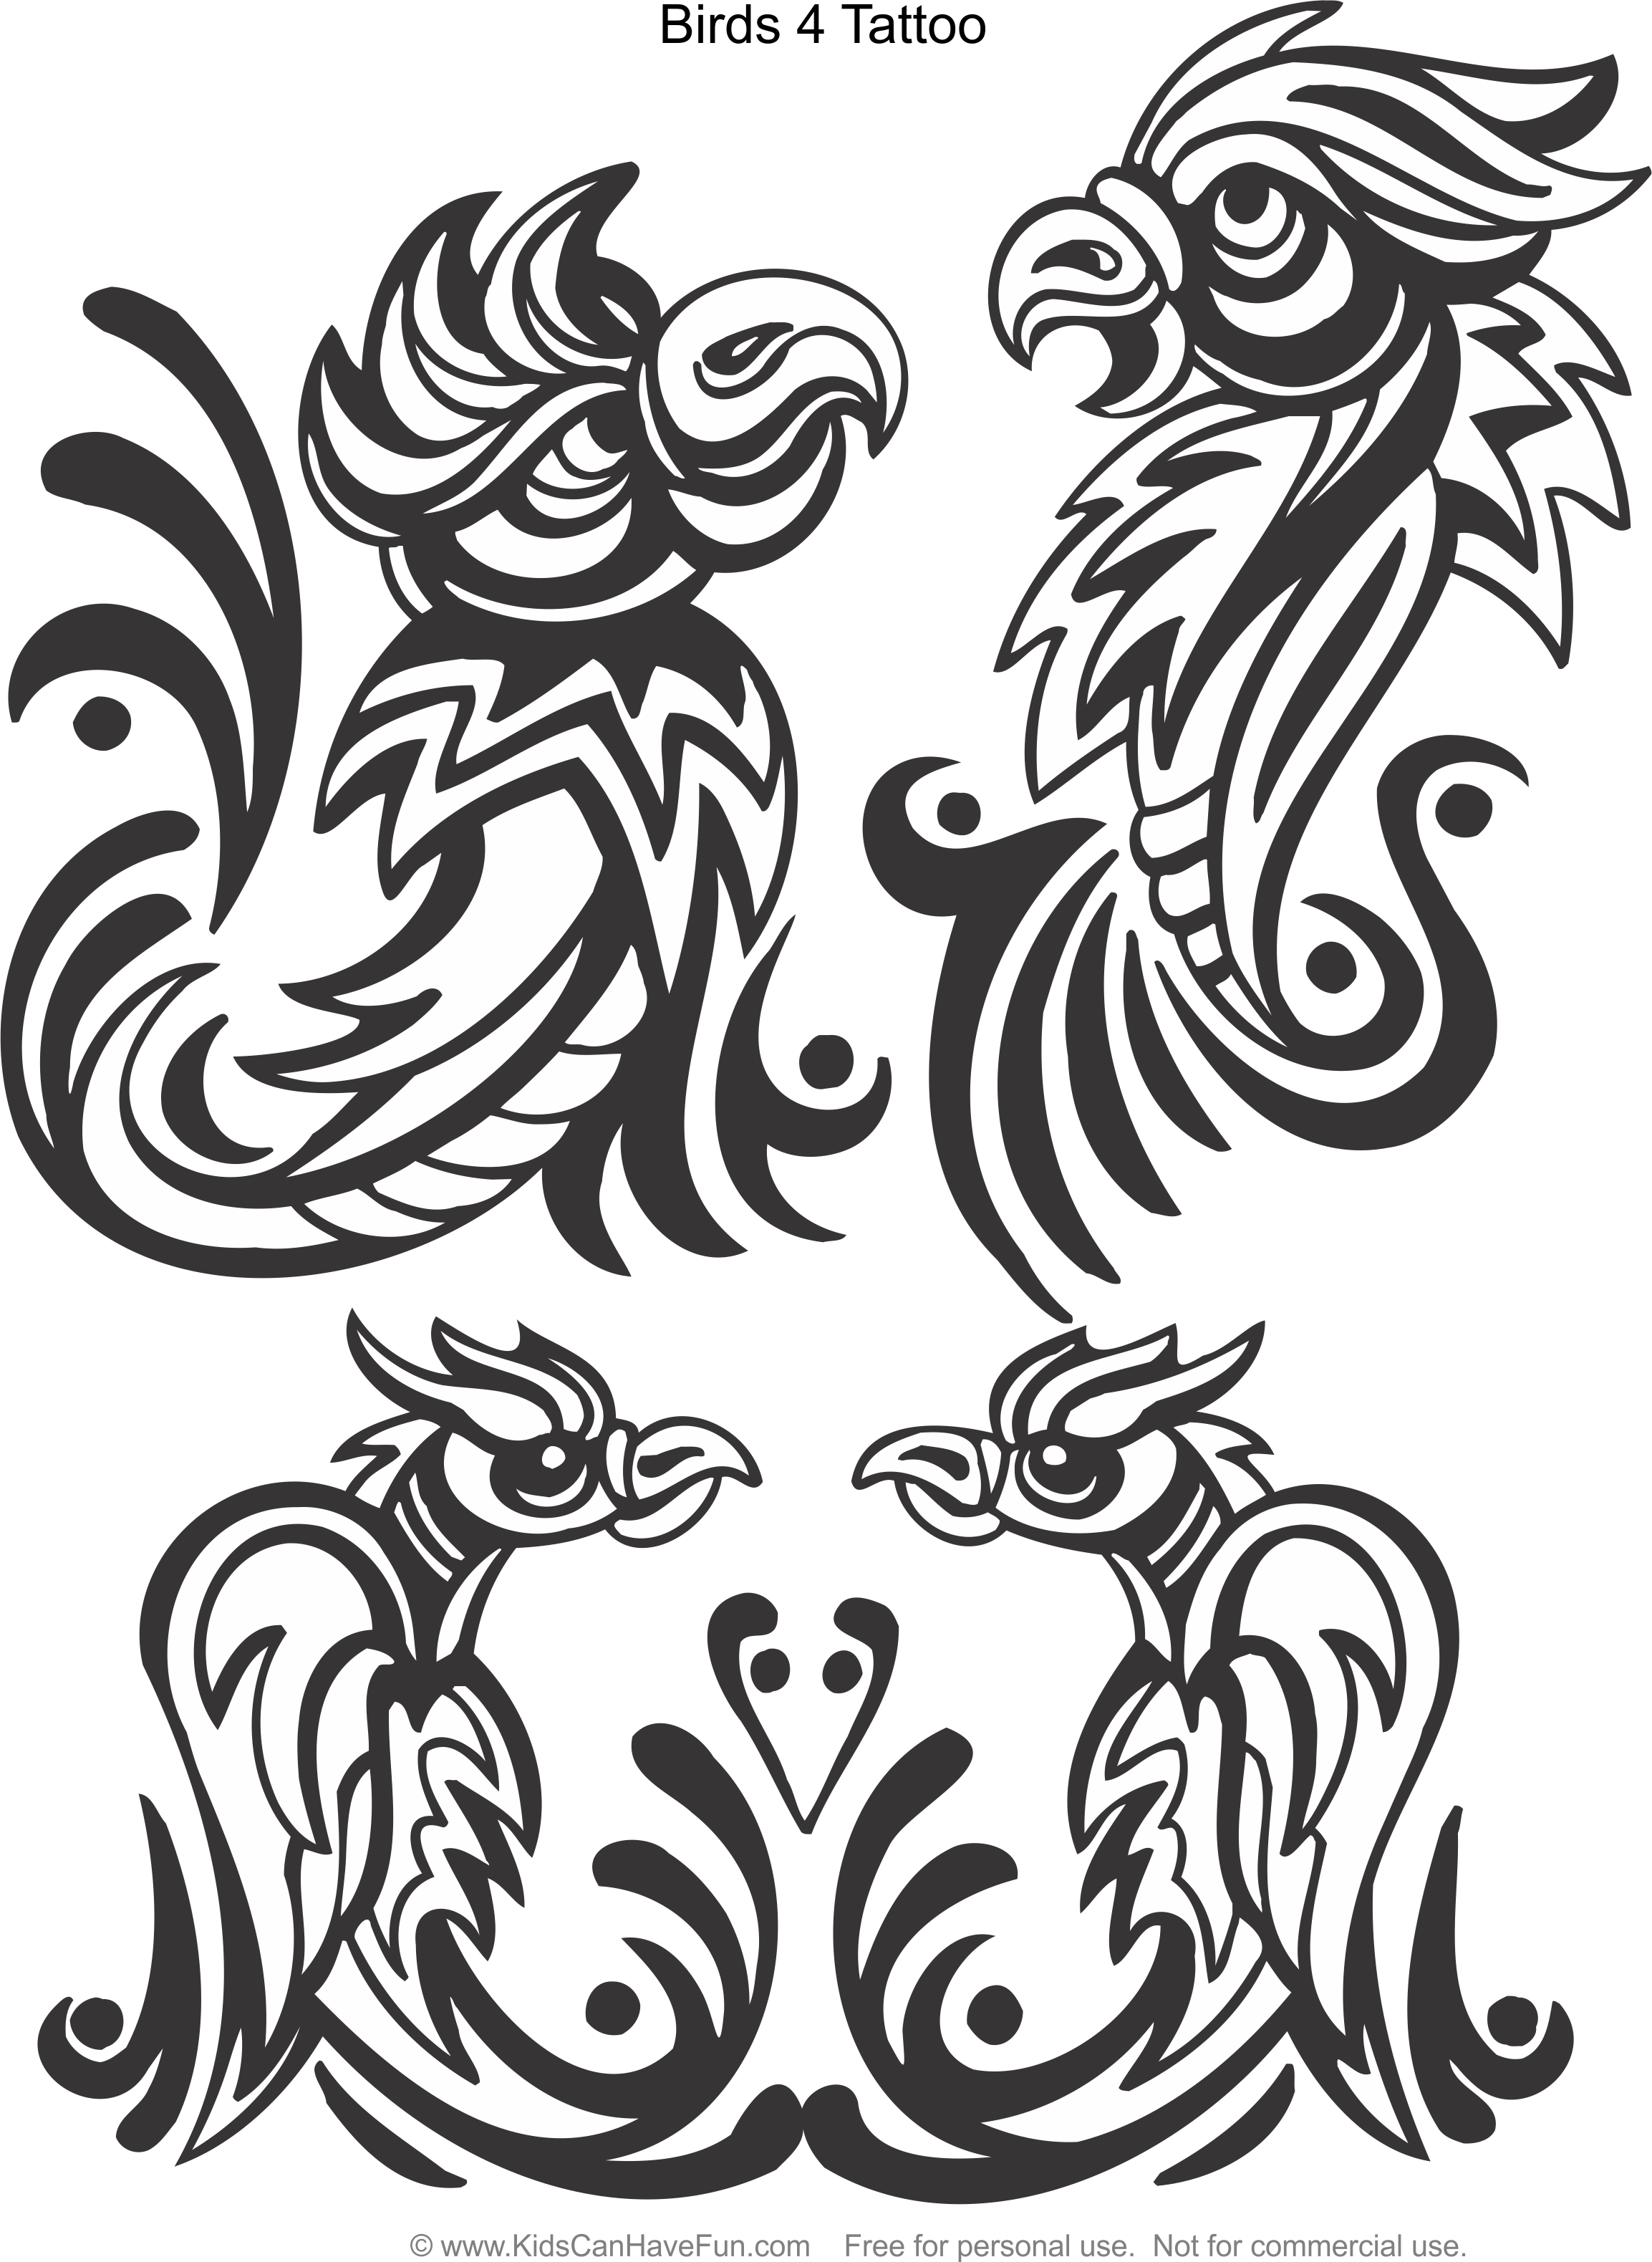 birds 4 tattoo design coloring page www kidscanhavefun com